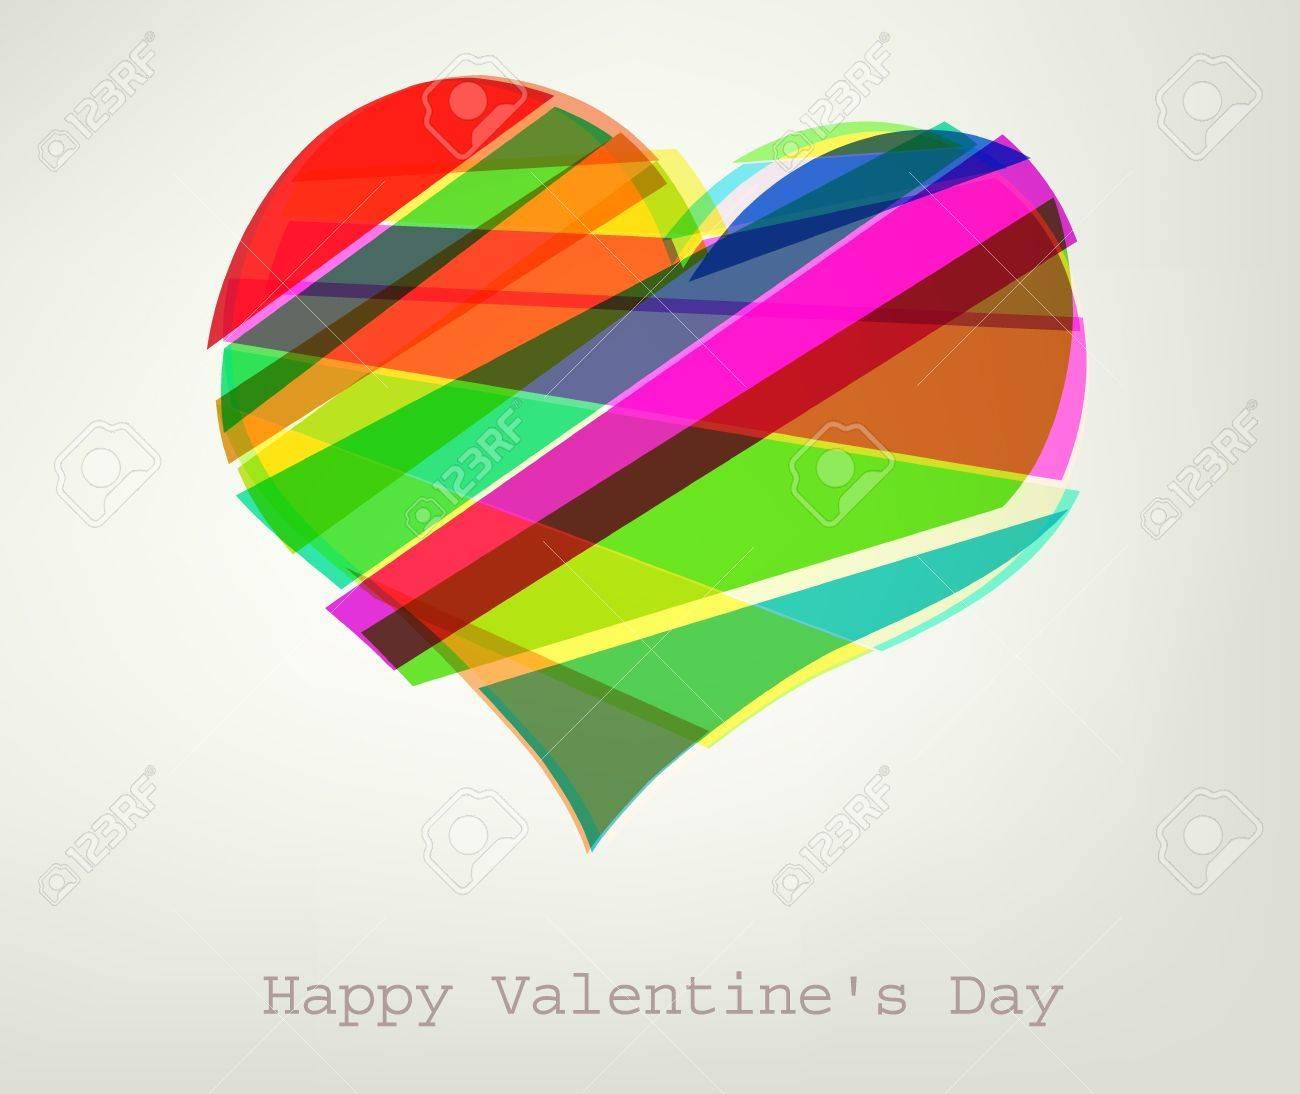 Heart Vector Illustration. Valentine - 11909478